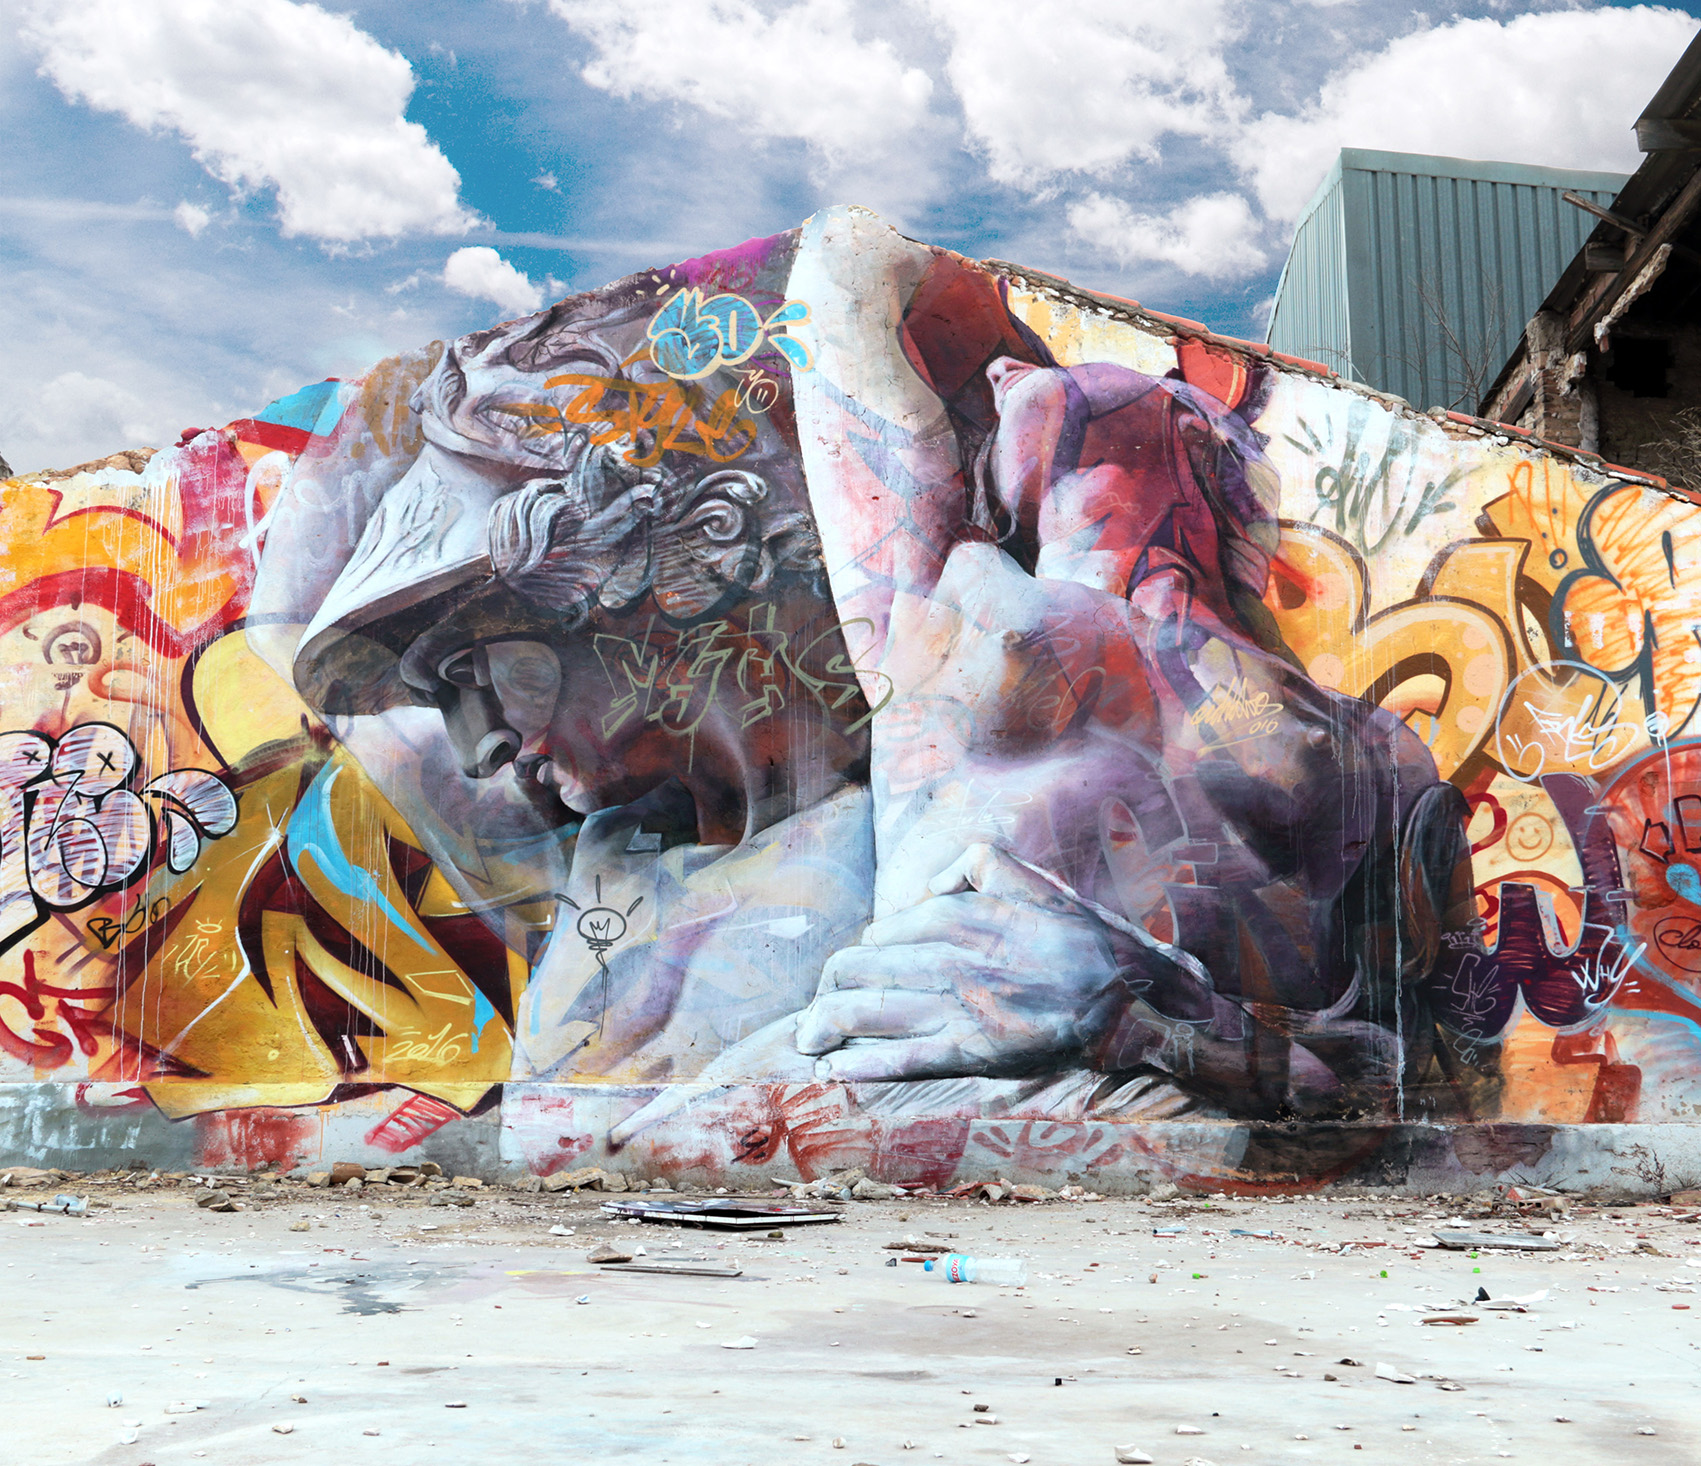 Mural in Valencia, image via Pichi & Avo